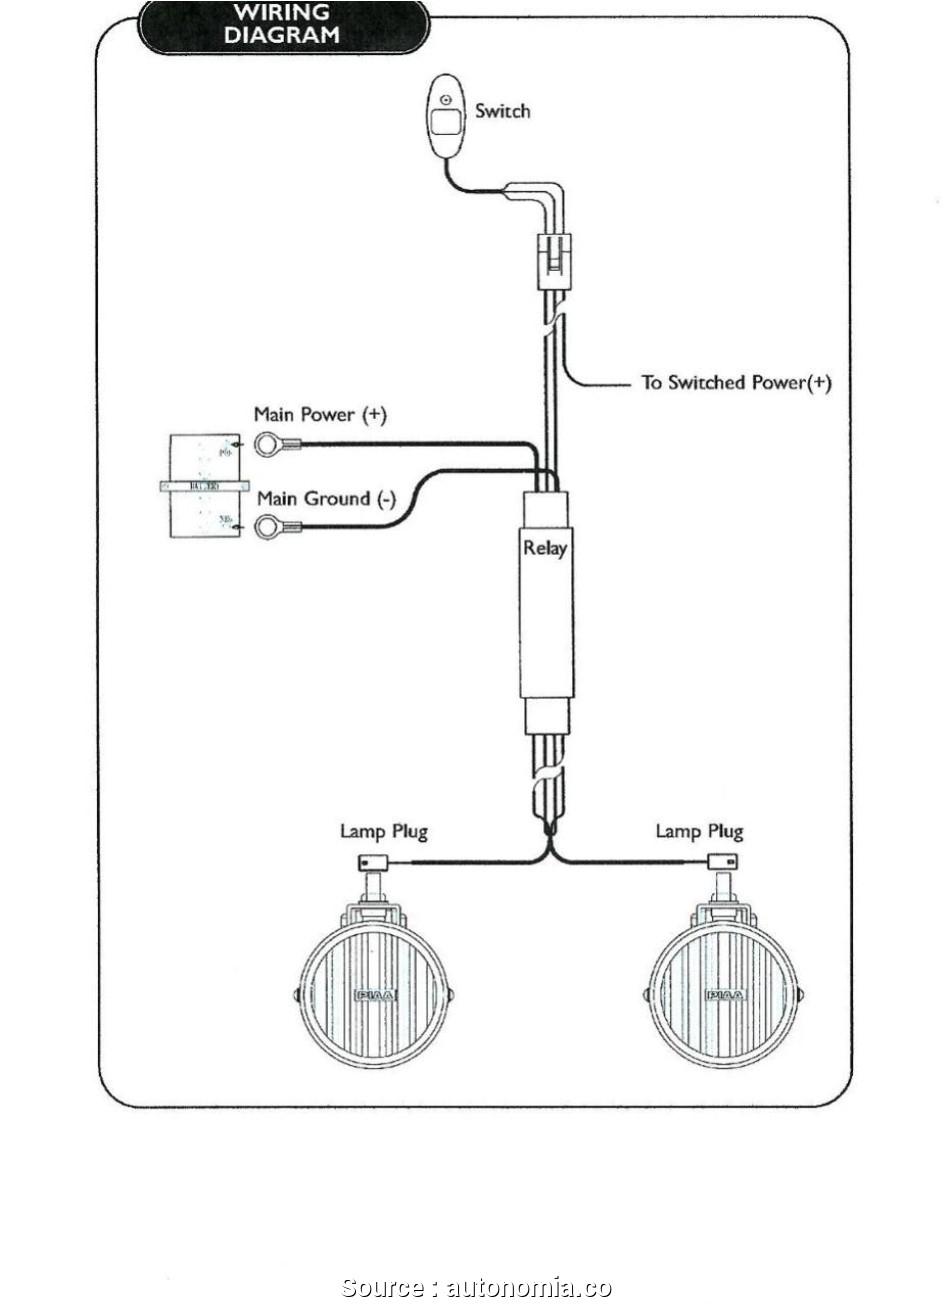 piaa fog light wiring diagram wiring diagram blog piaa fog light wiring diagram wiring diagram article